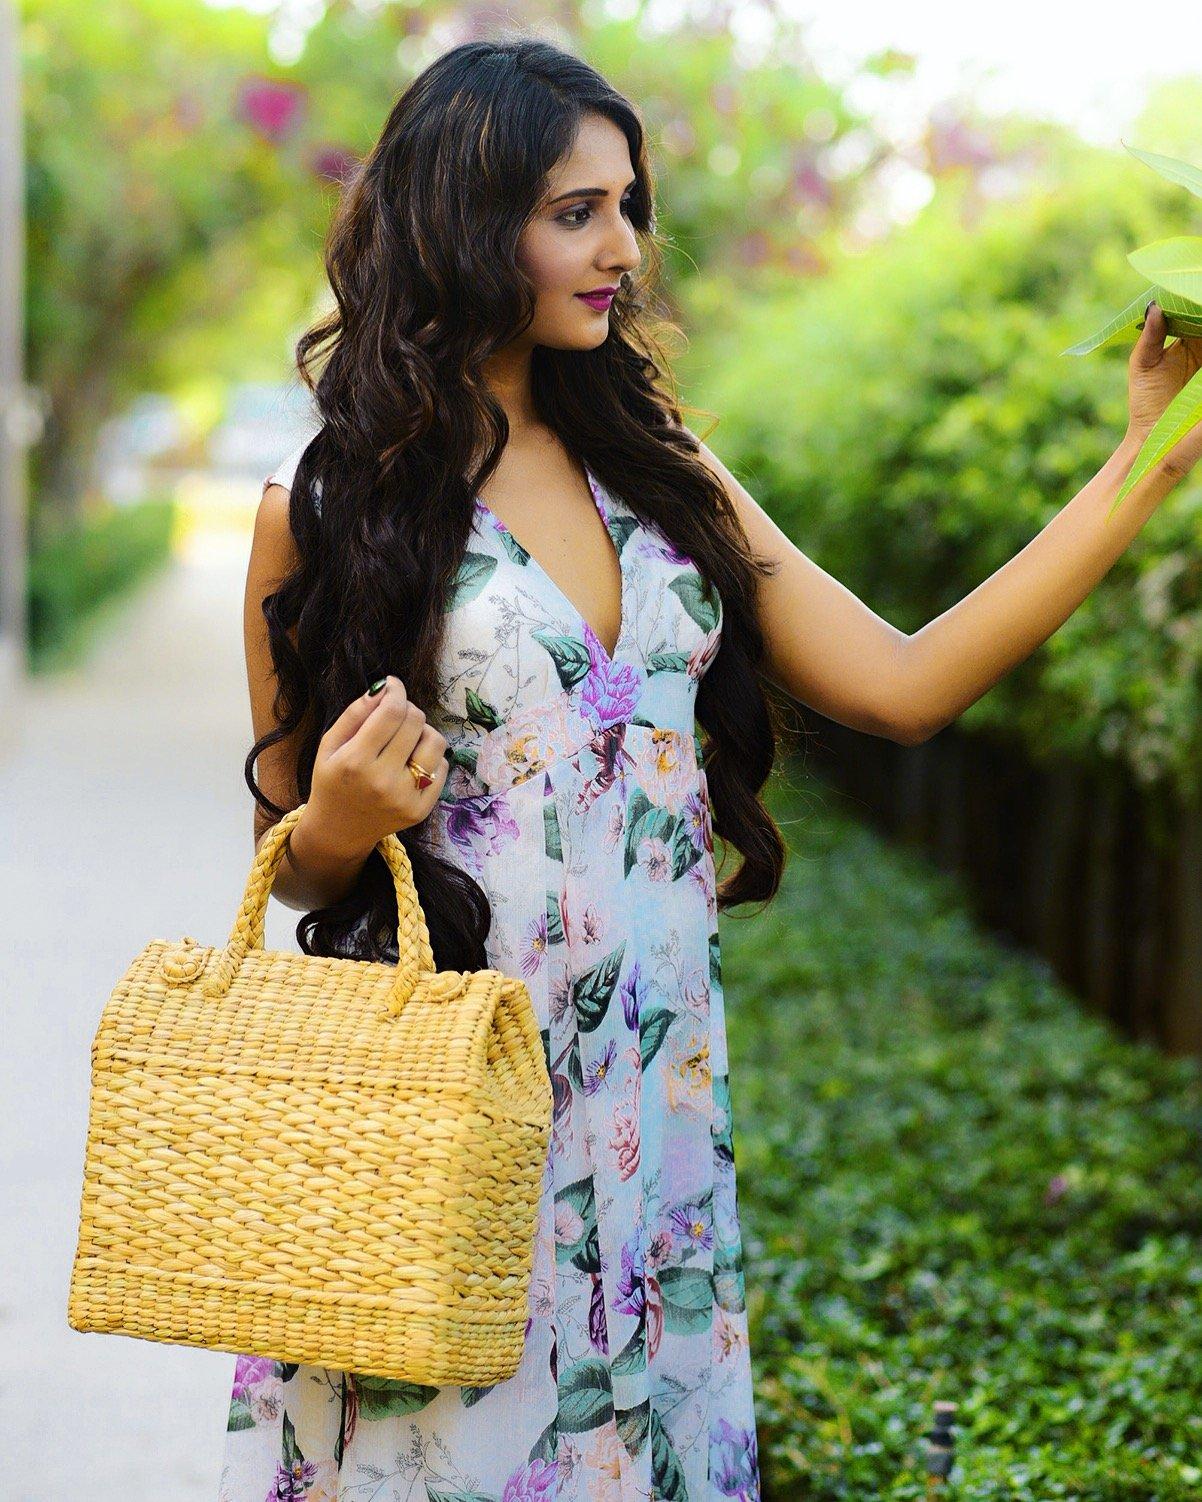 Kauna Reed Basket Bag